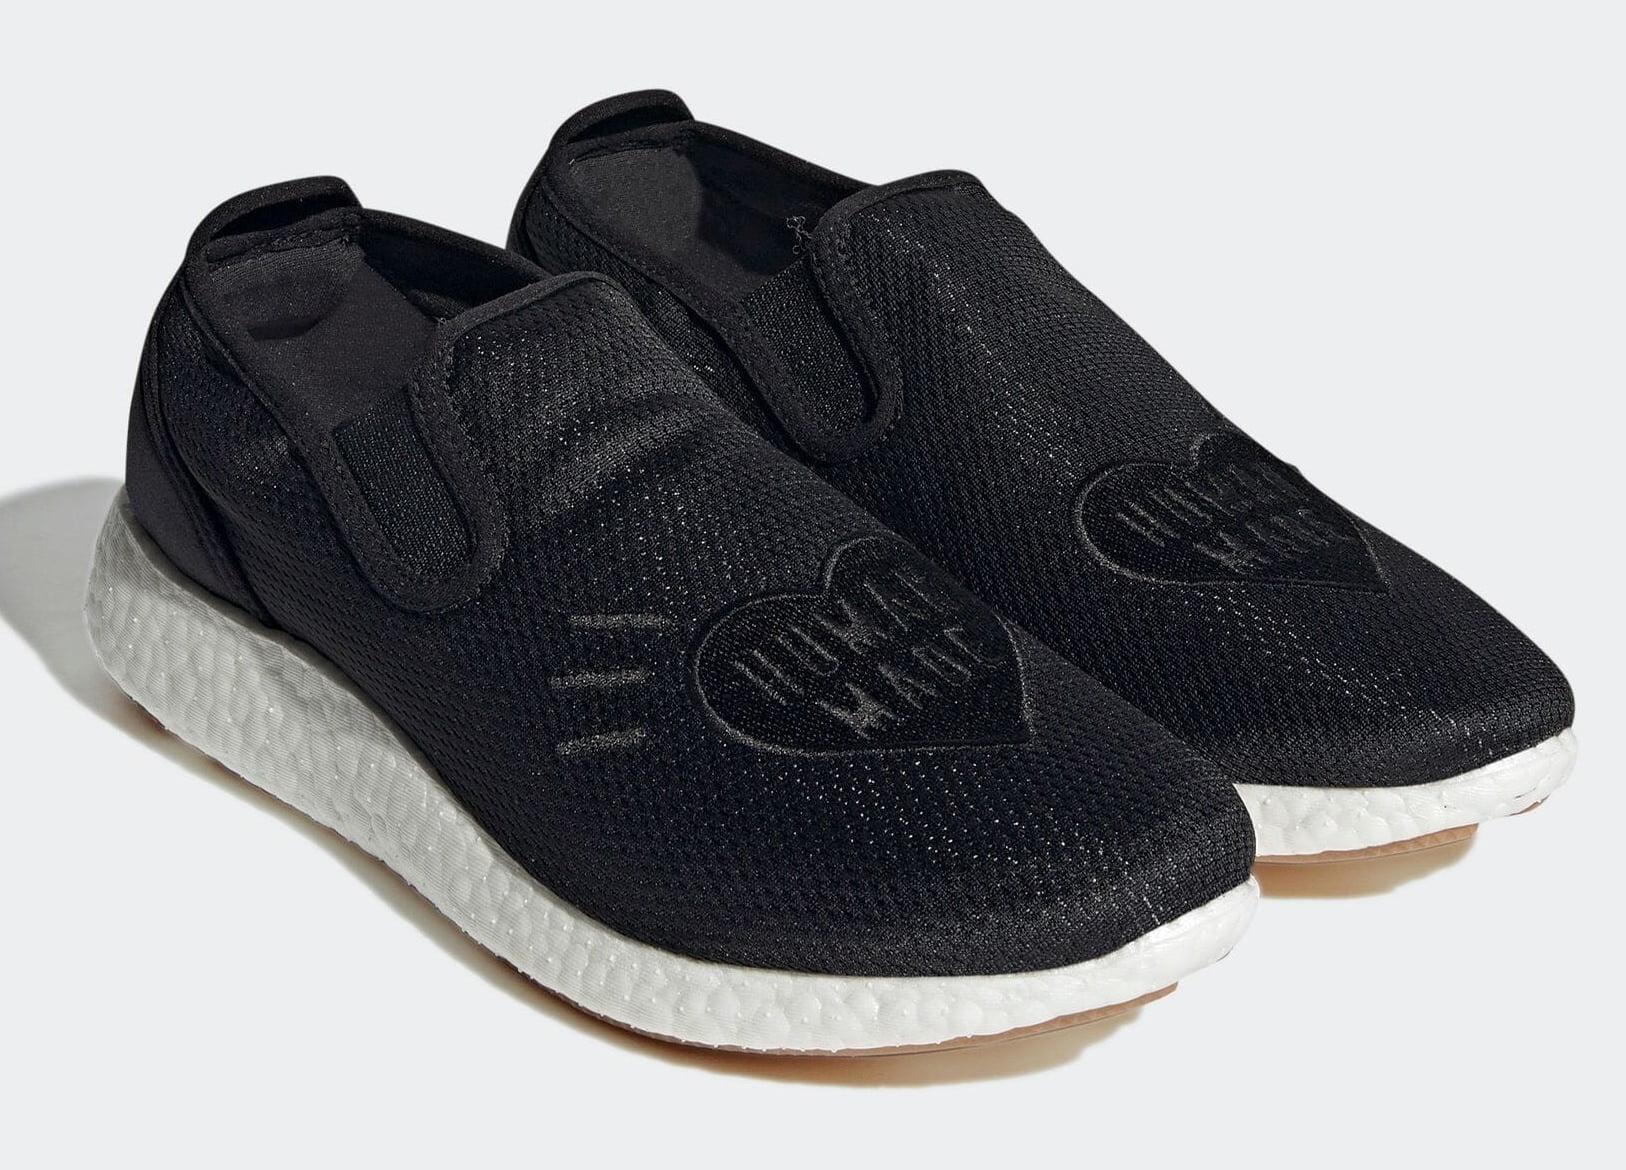 HUMAN MADE x ADIDAS ORIGINALS PURE SLIP ON H02546 3 Human Made x adidas Originals Slip-On PureBoost